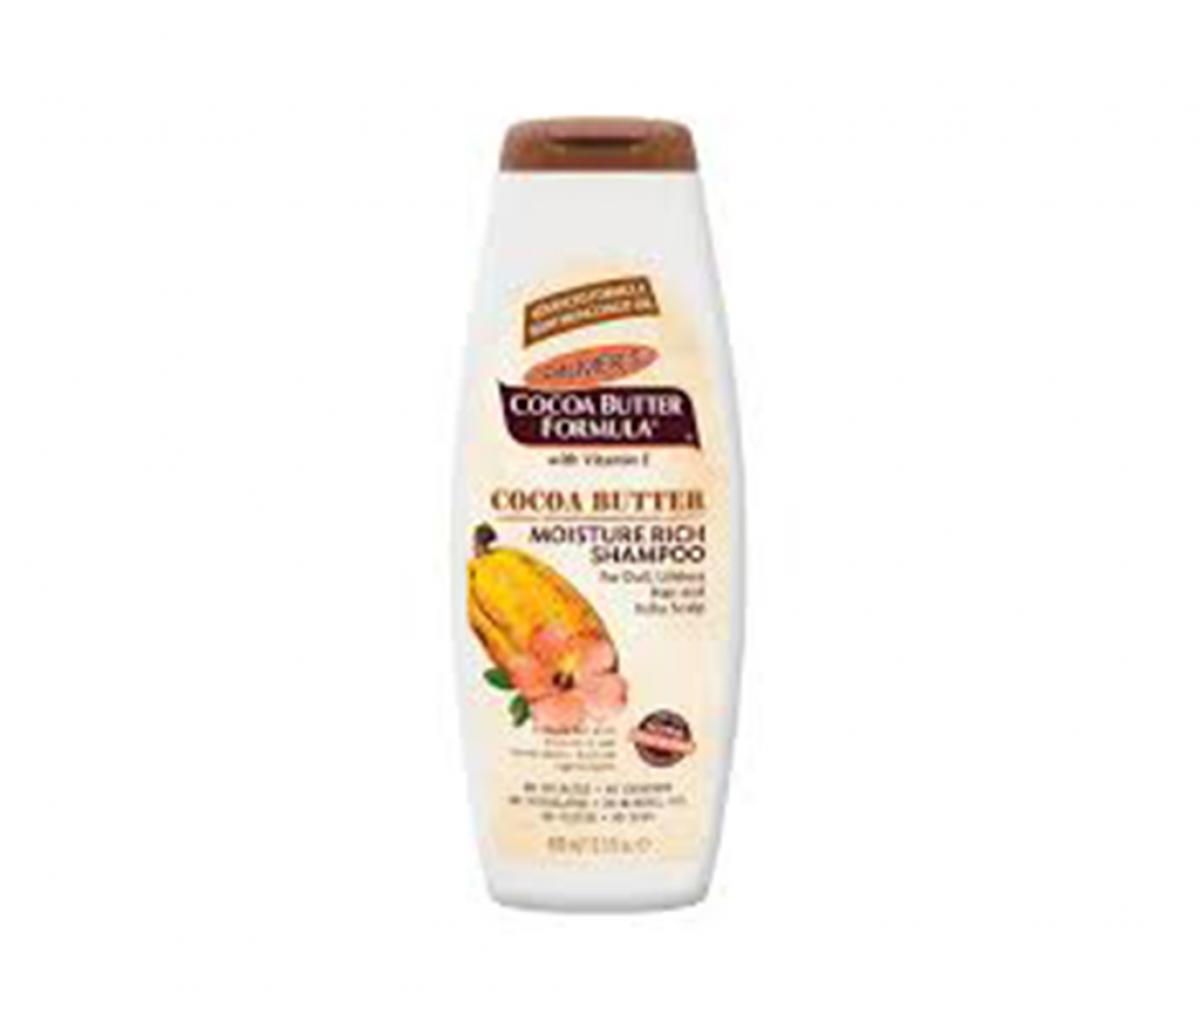 Palmers cocoa butter formula shampoo